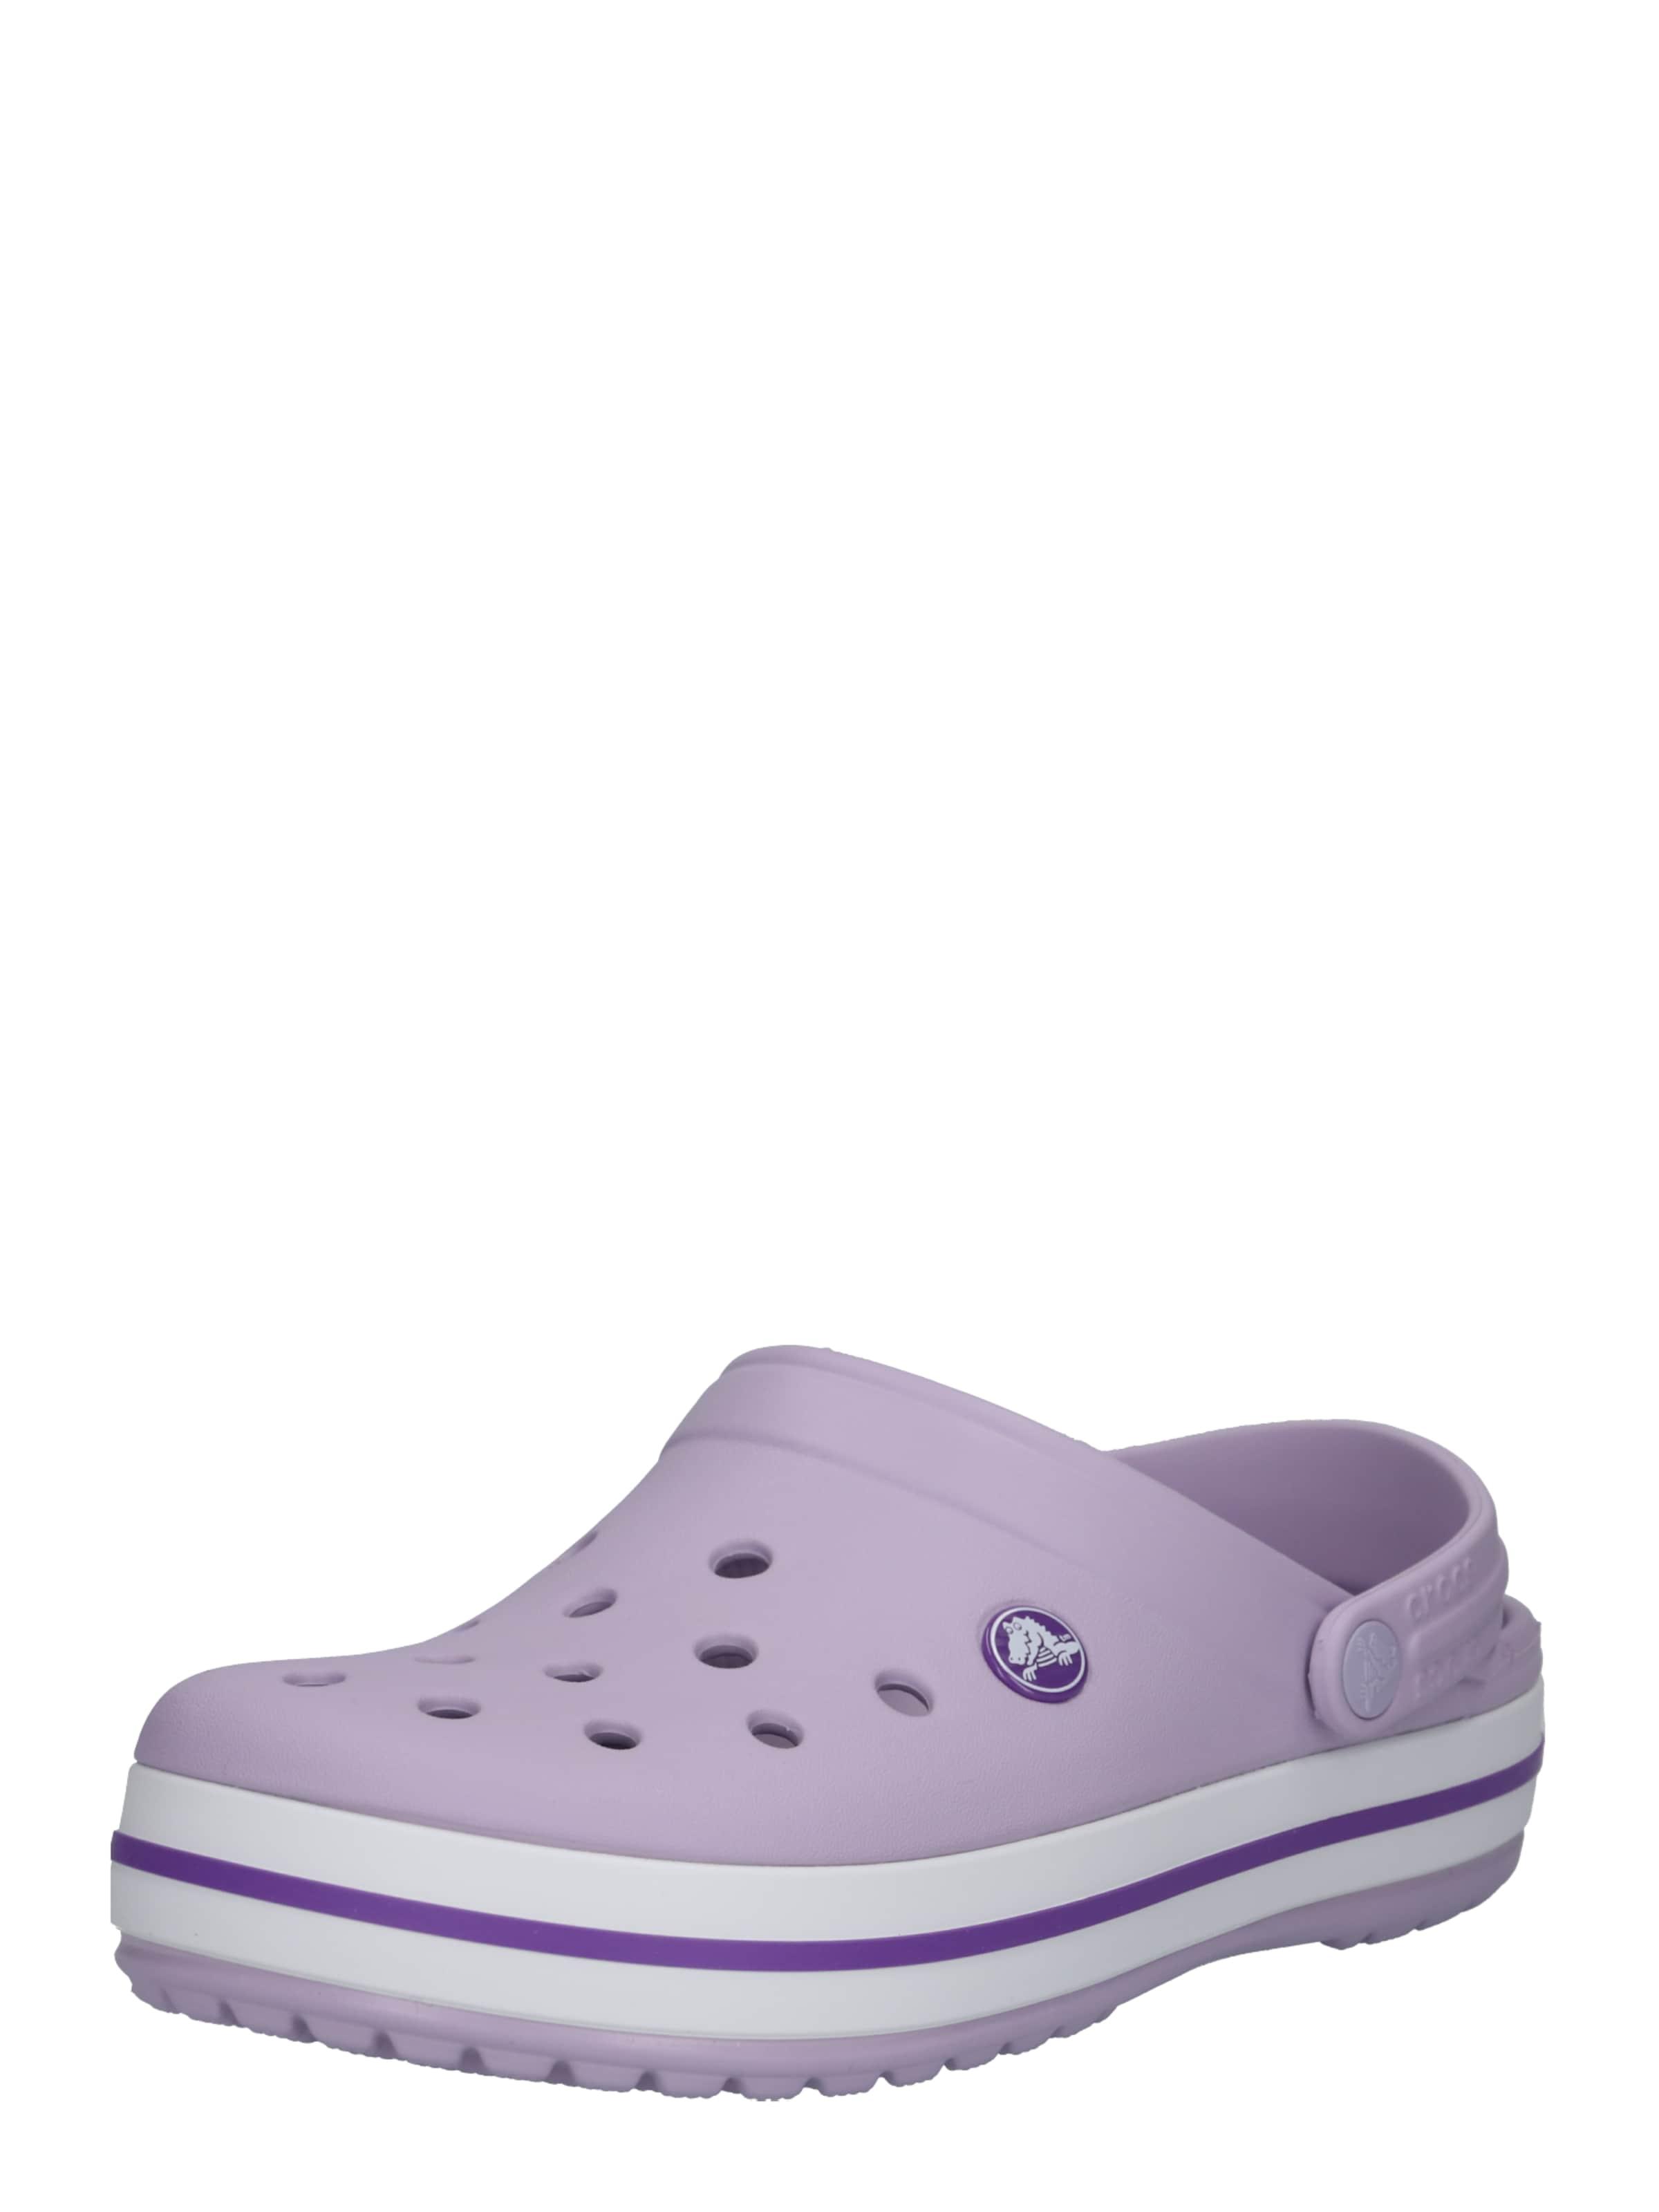 En Crocs Violet 'crocband' En 'crocband' Sabots Crocs Sabots 5LqA43Rj